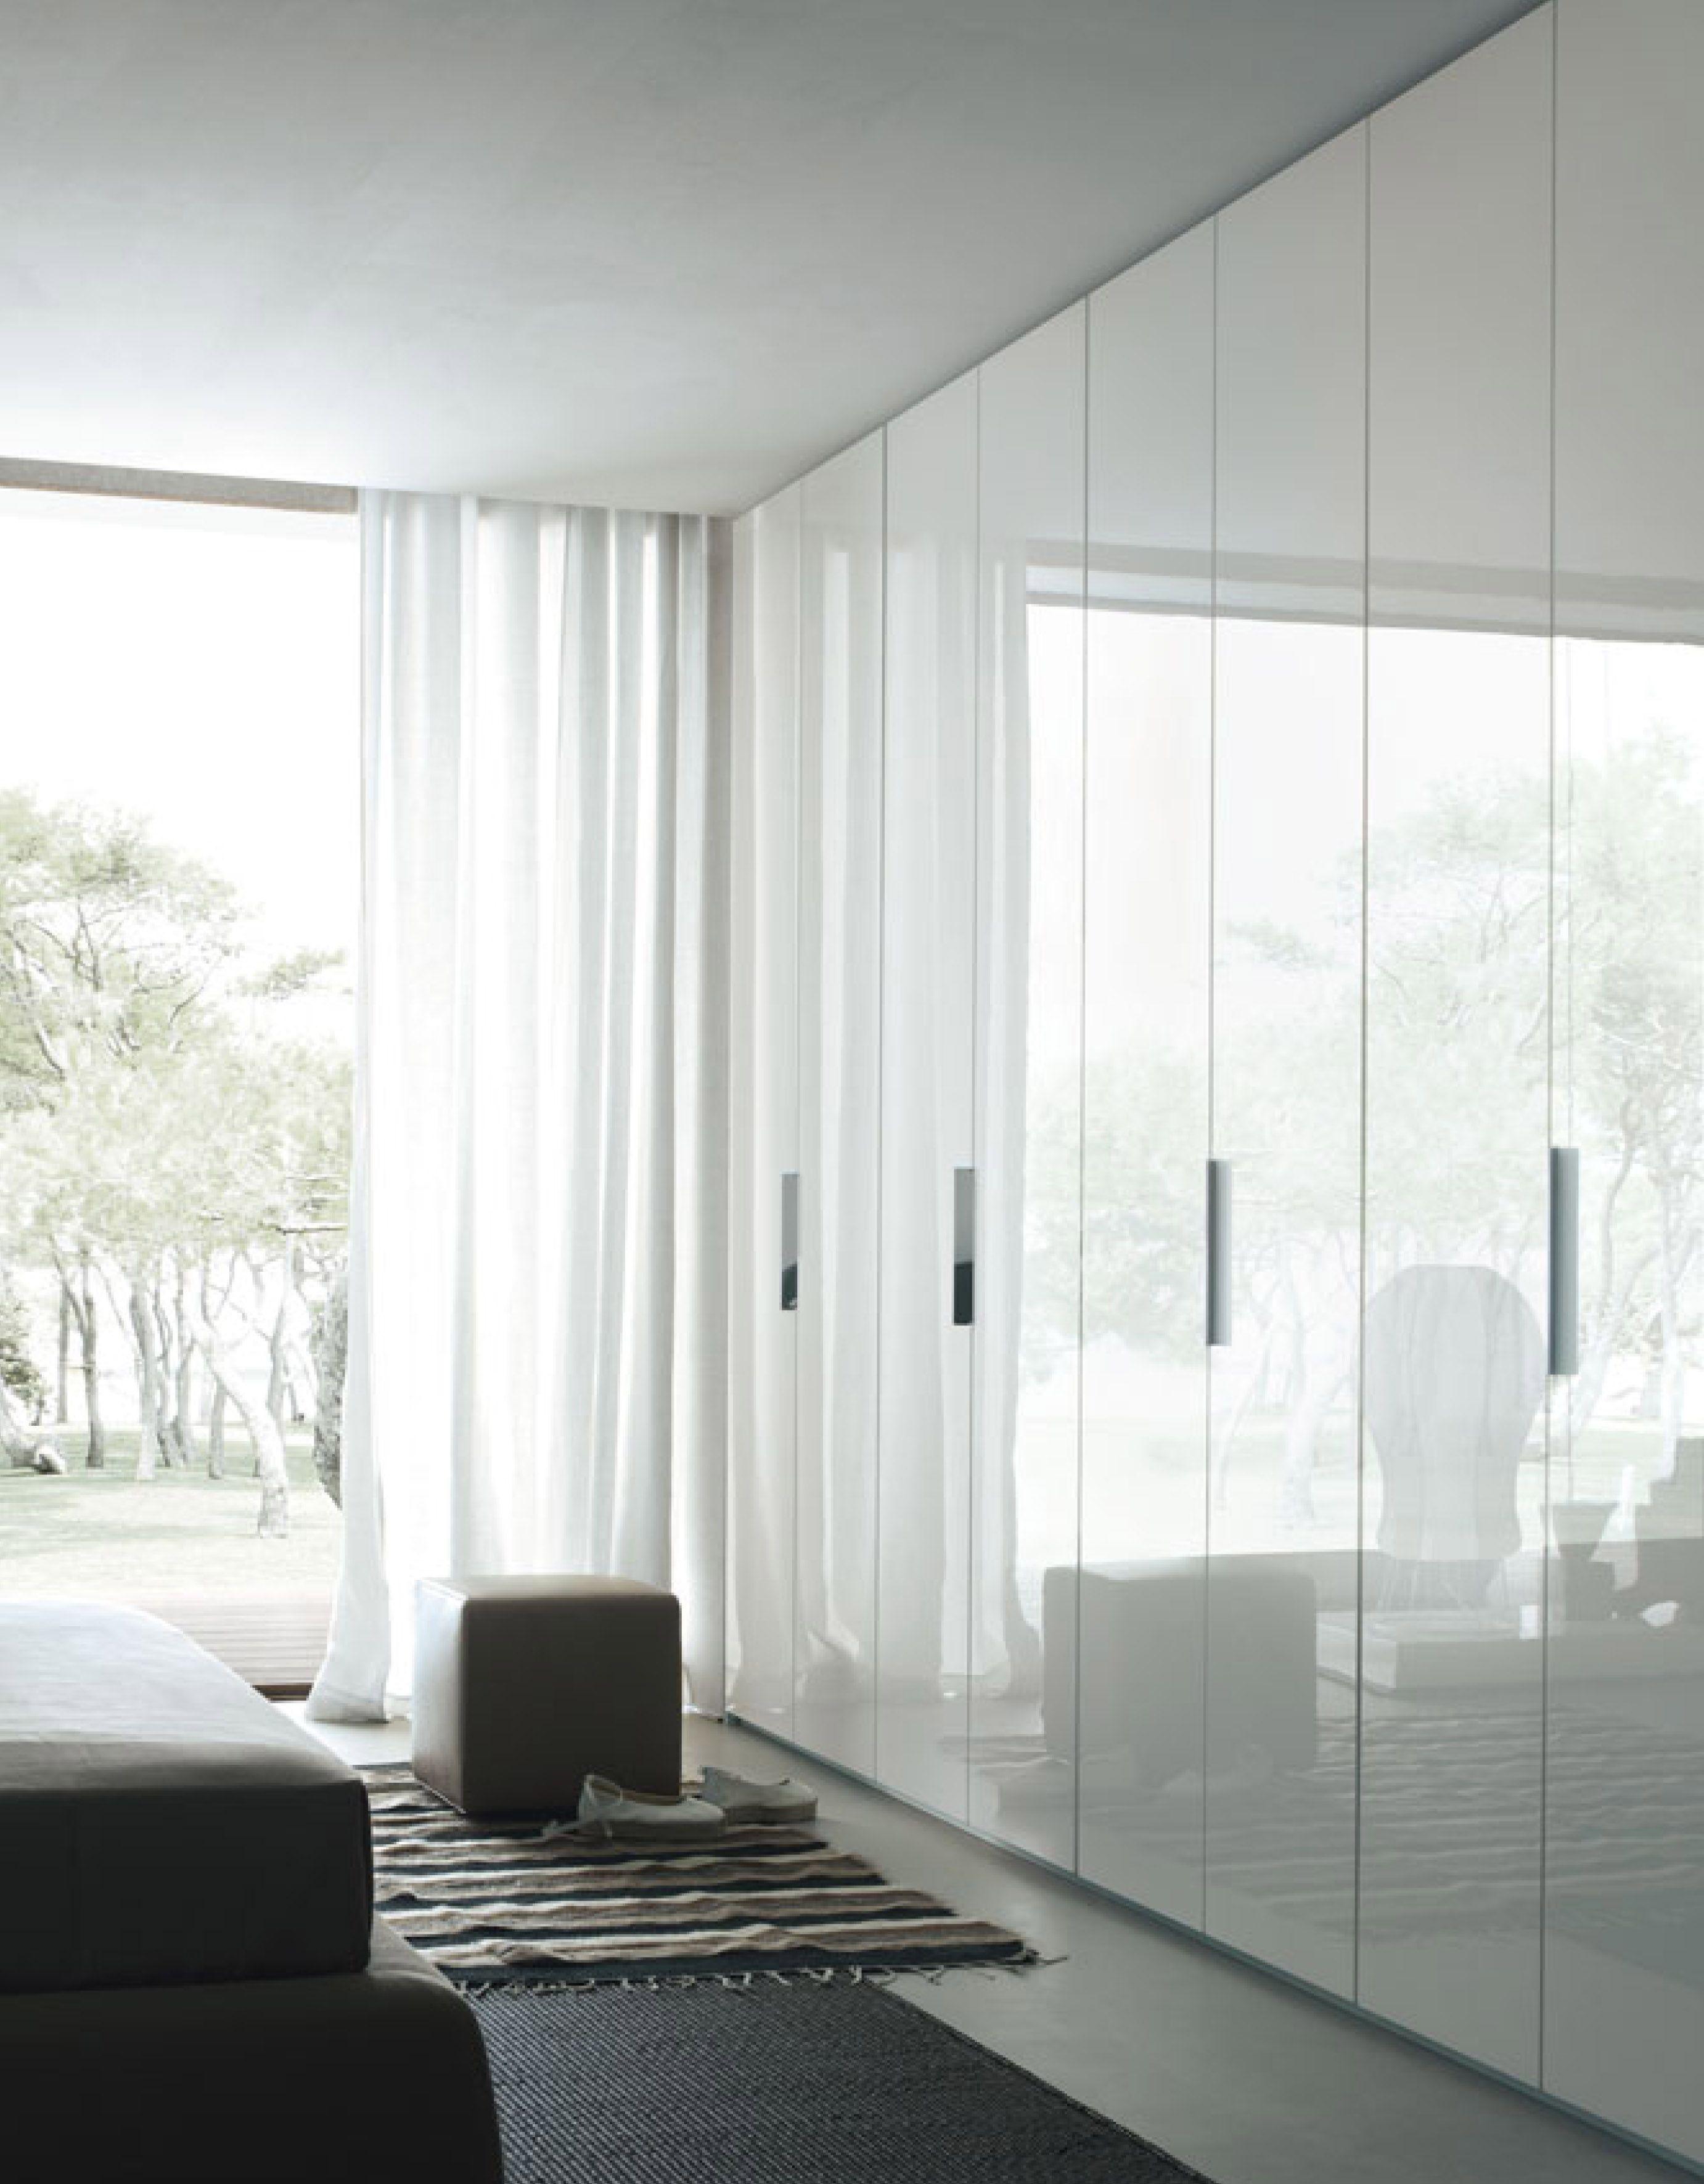 Modern closet curtains -  Wardrobes Closet Armoire Storage Hardware Accessories For Wardrobes Dressing Room